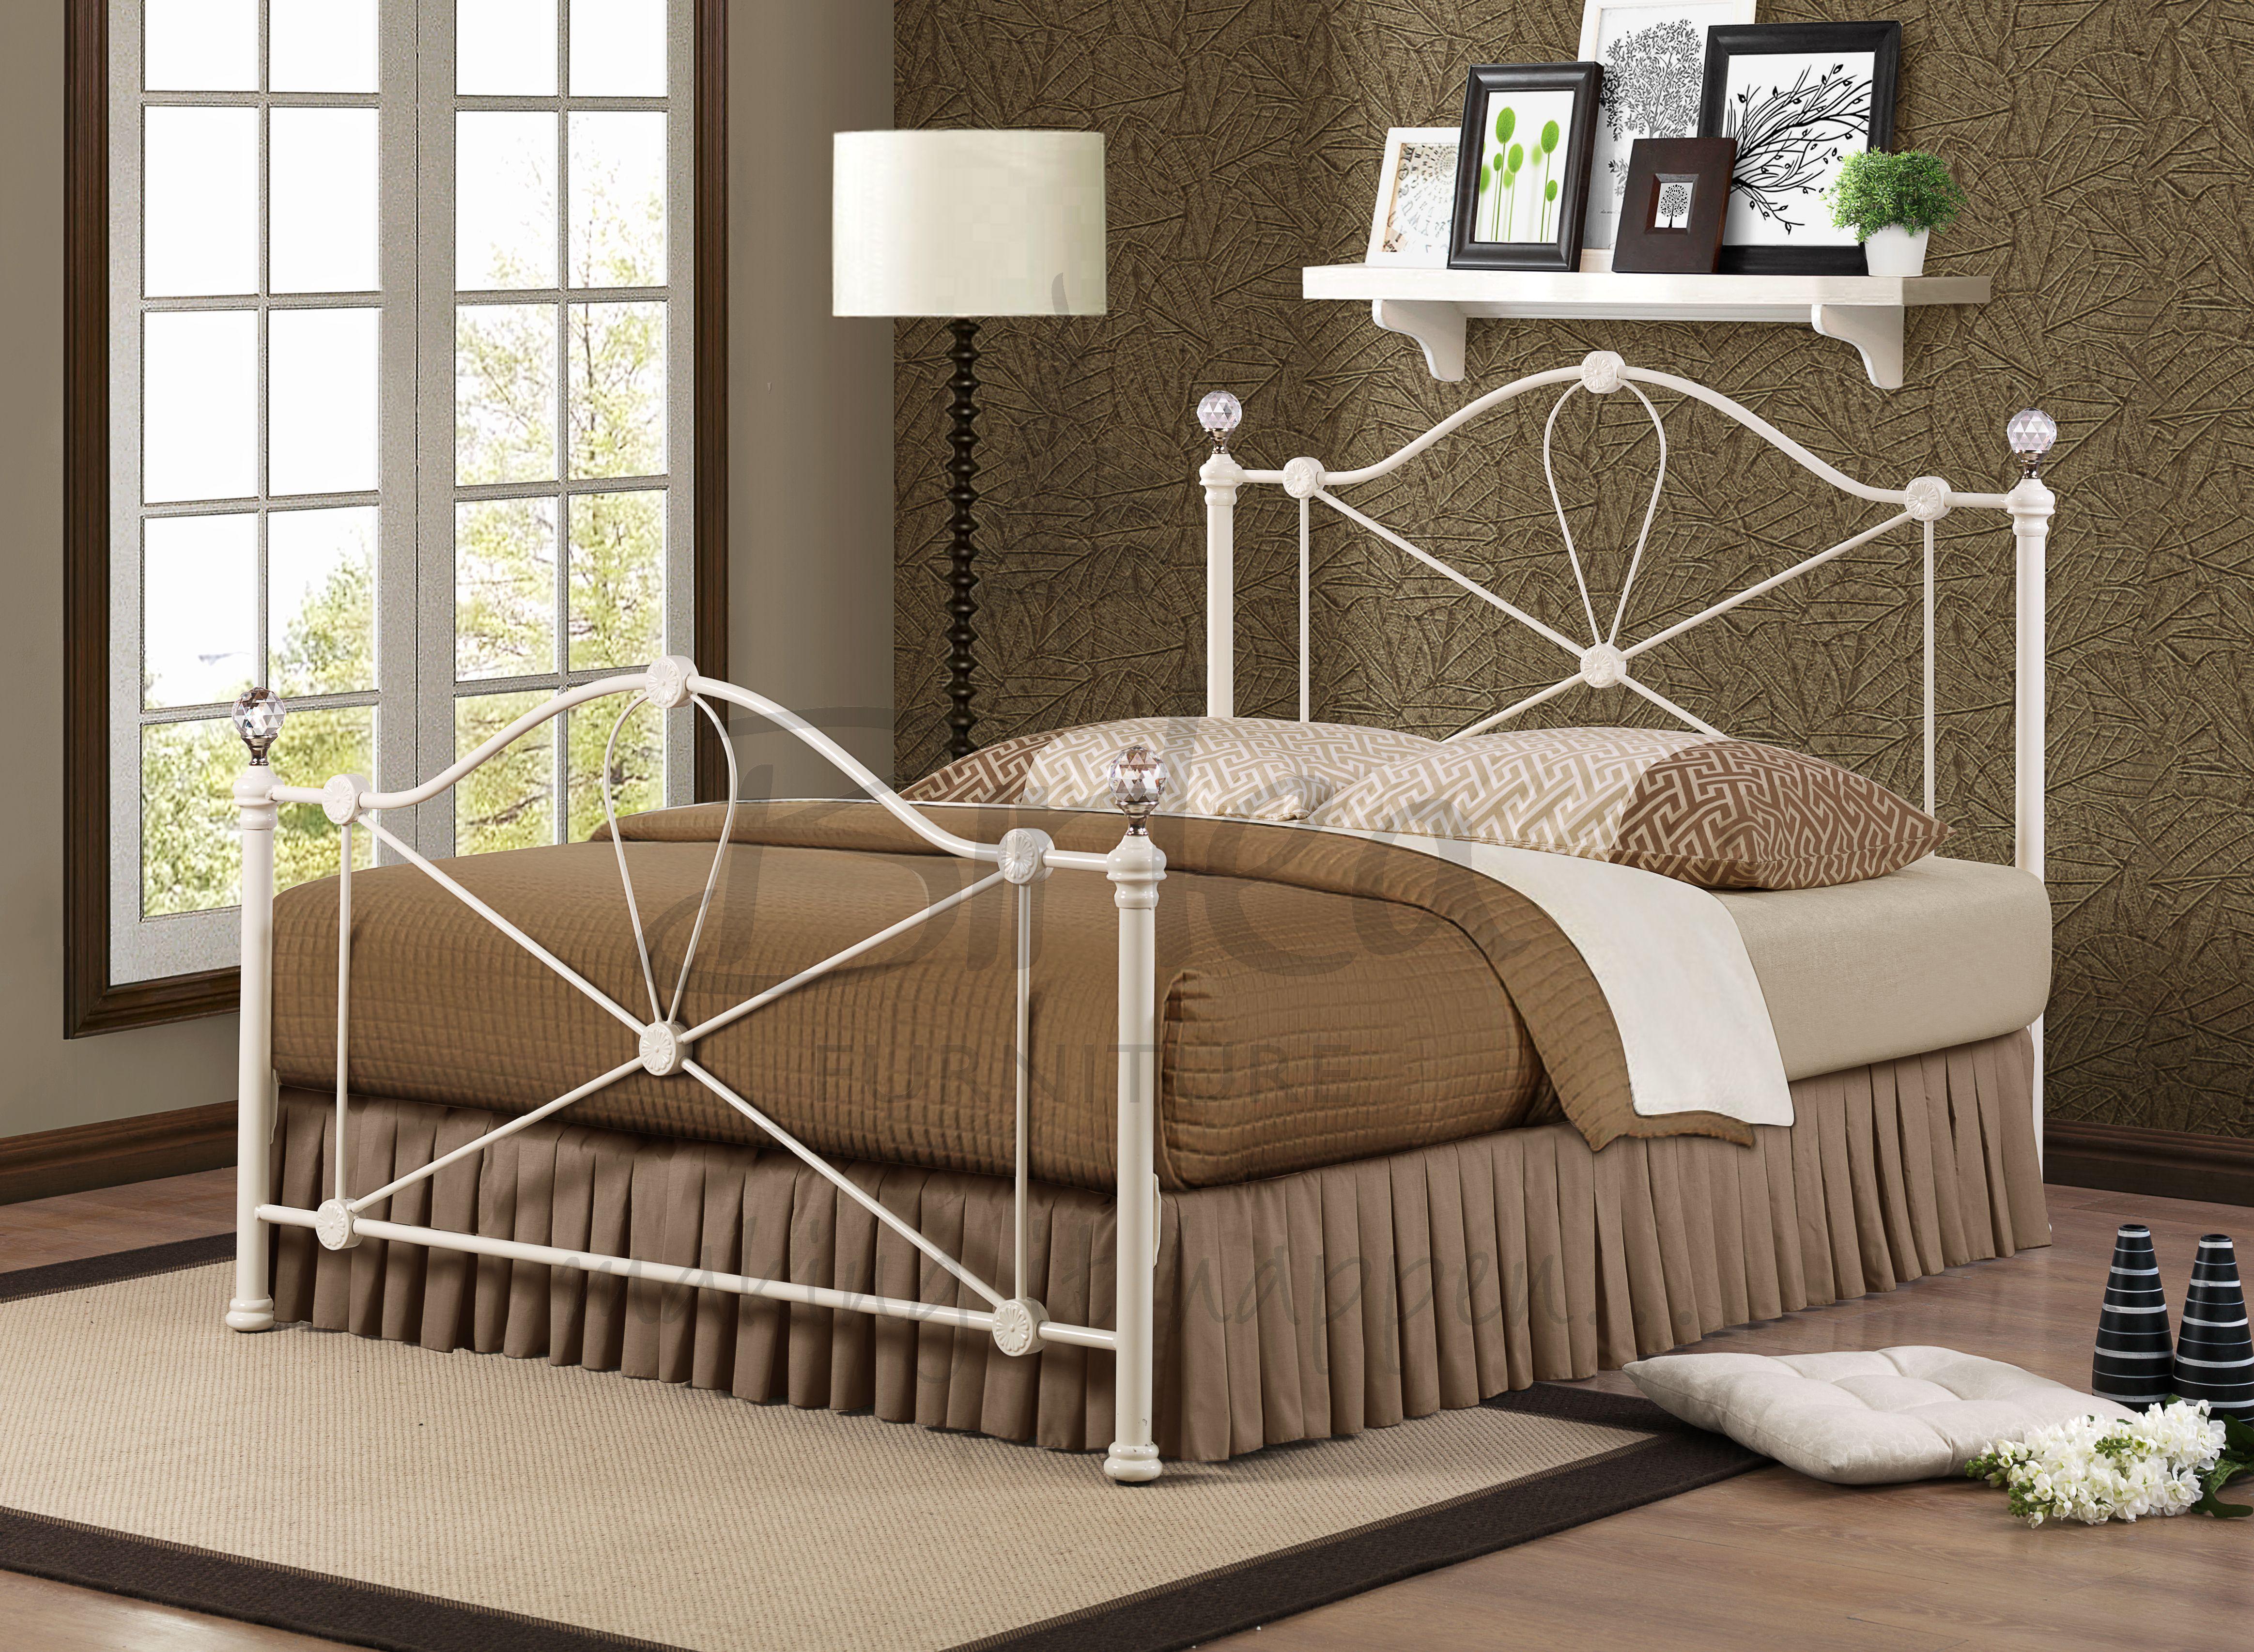 Modern Metal Bed Frames modern metal bed frame